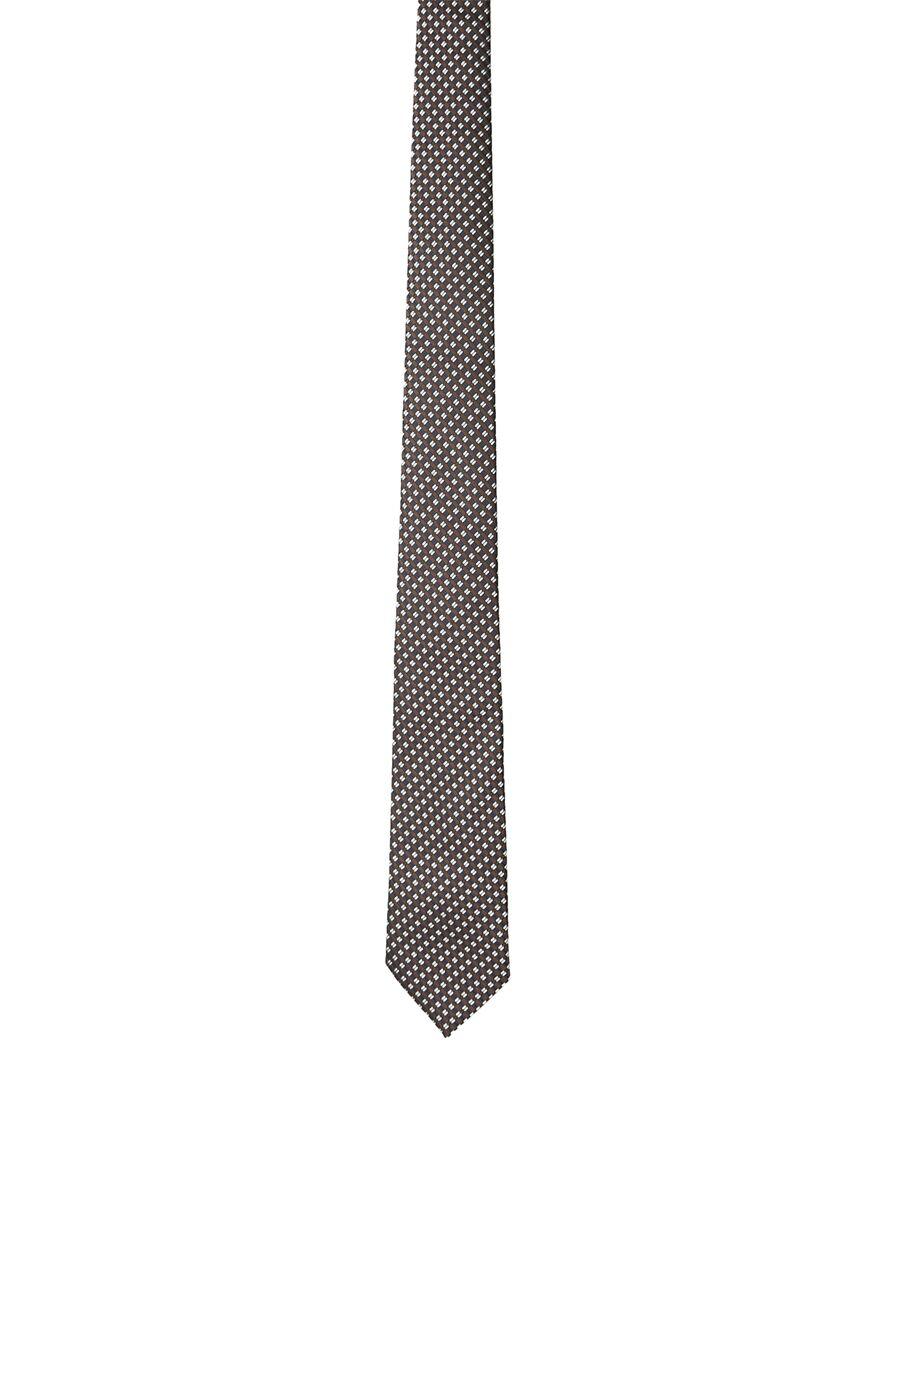 Lacivert-Kahverengi Erkek Kravat